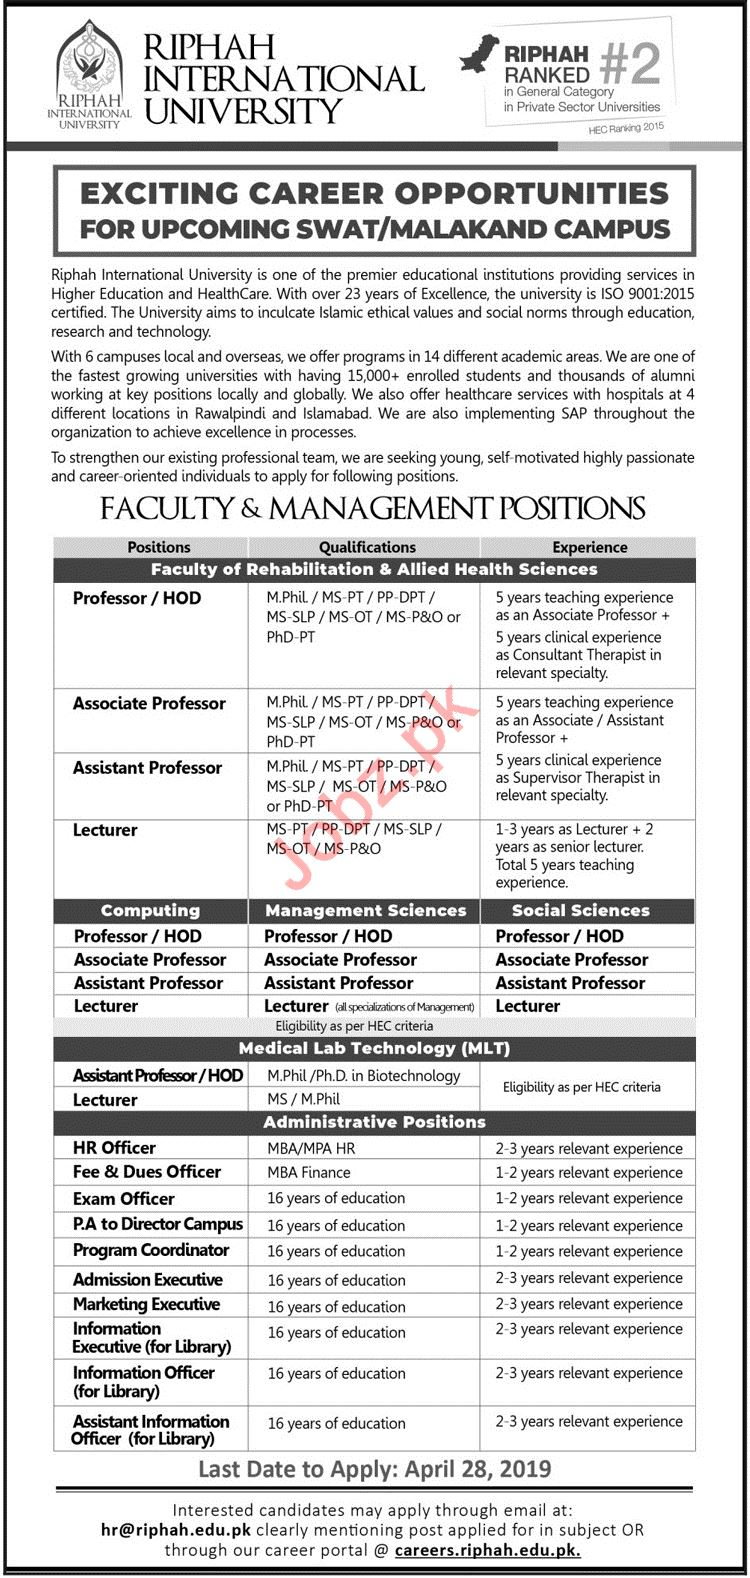 Riphah International University Jobs 2019 in Swat & Malakand